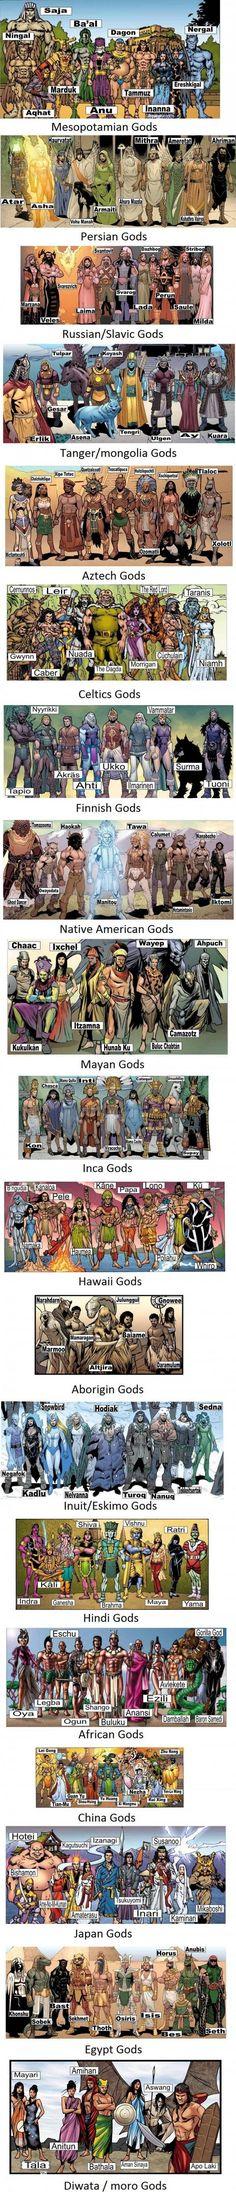 Gods - Imgur